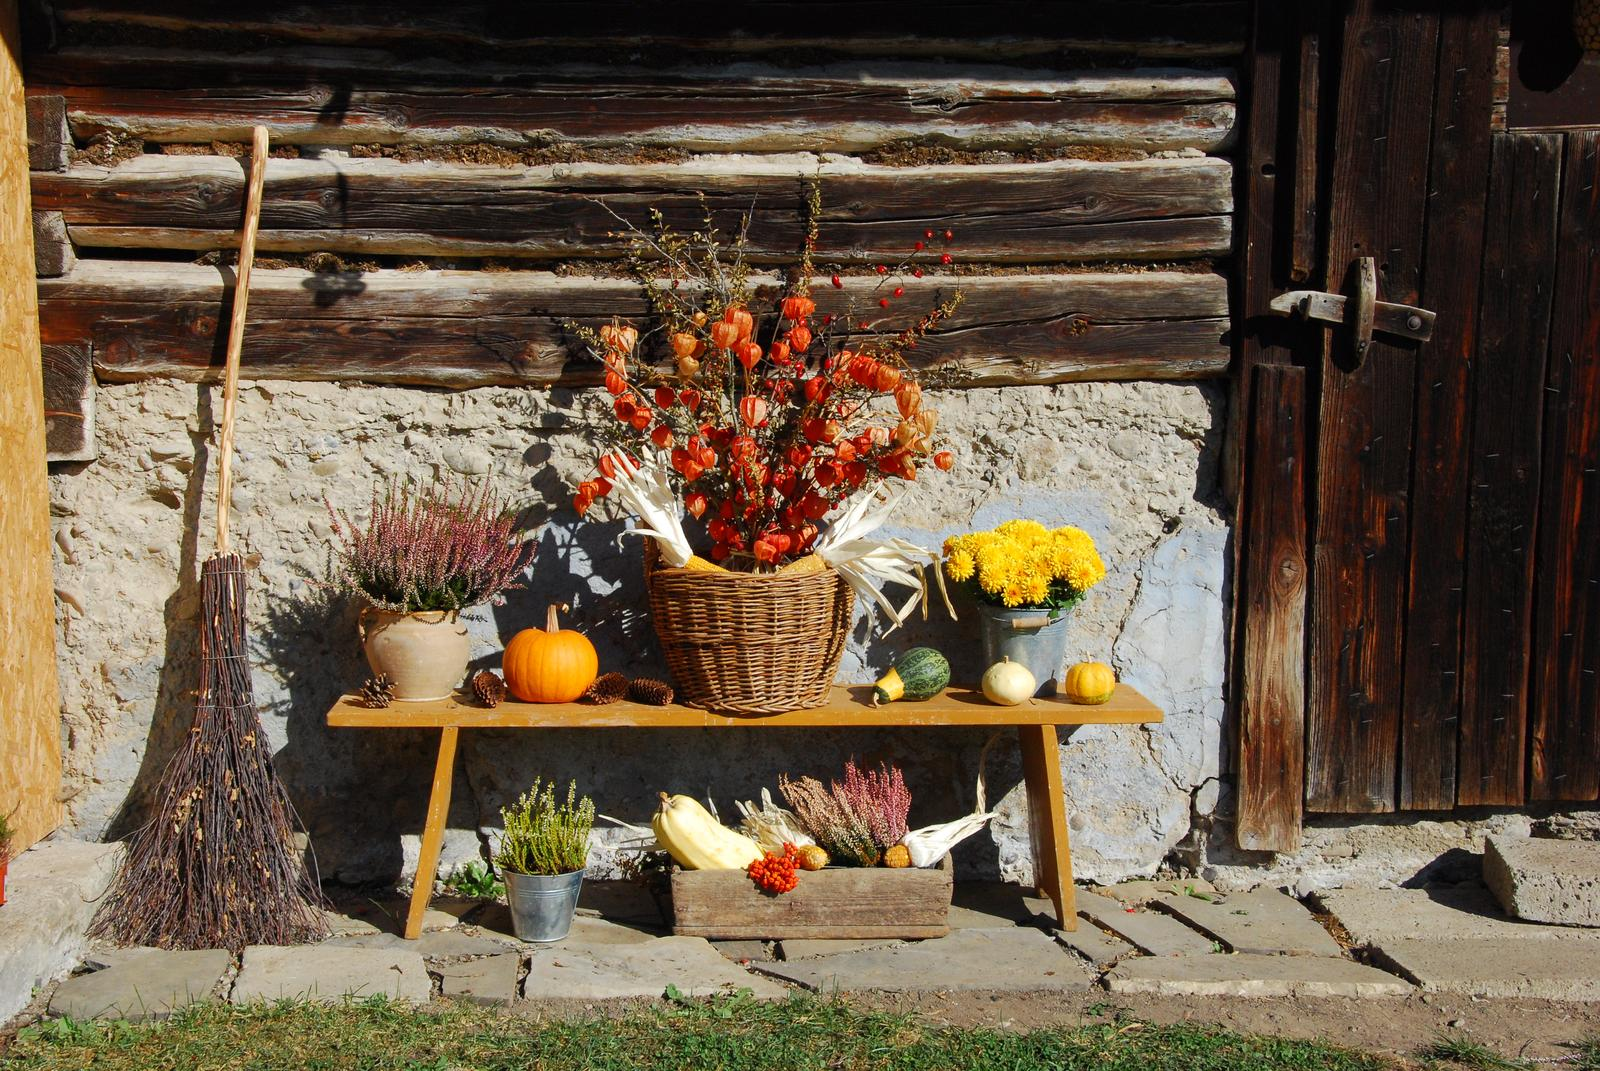 Jesen u nás doma - Obrázok č. 2